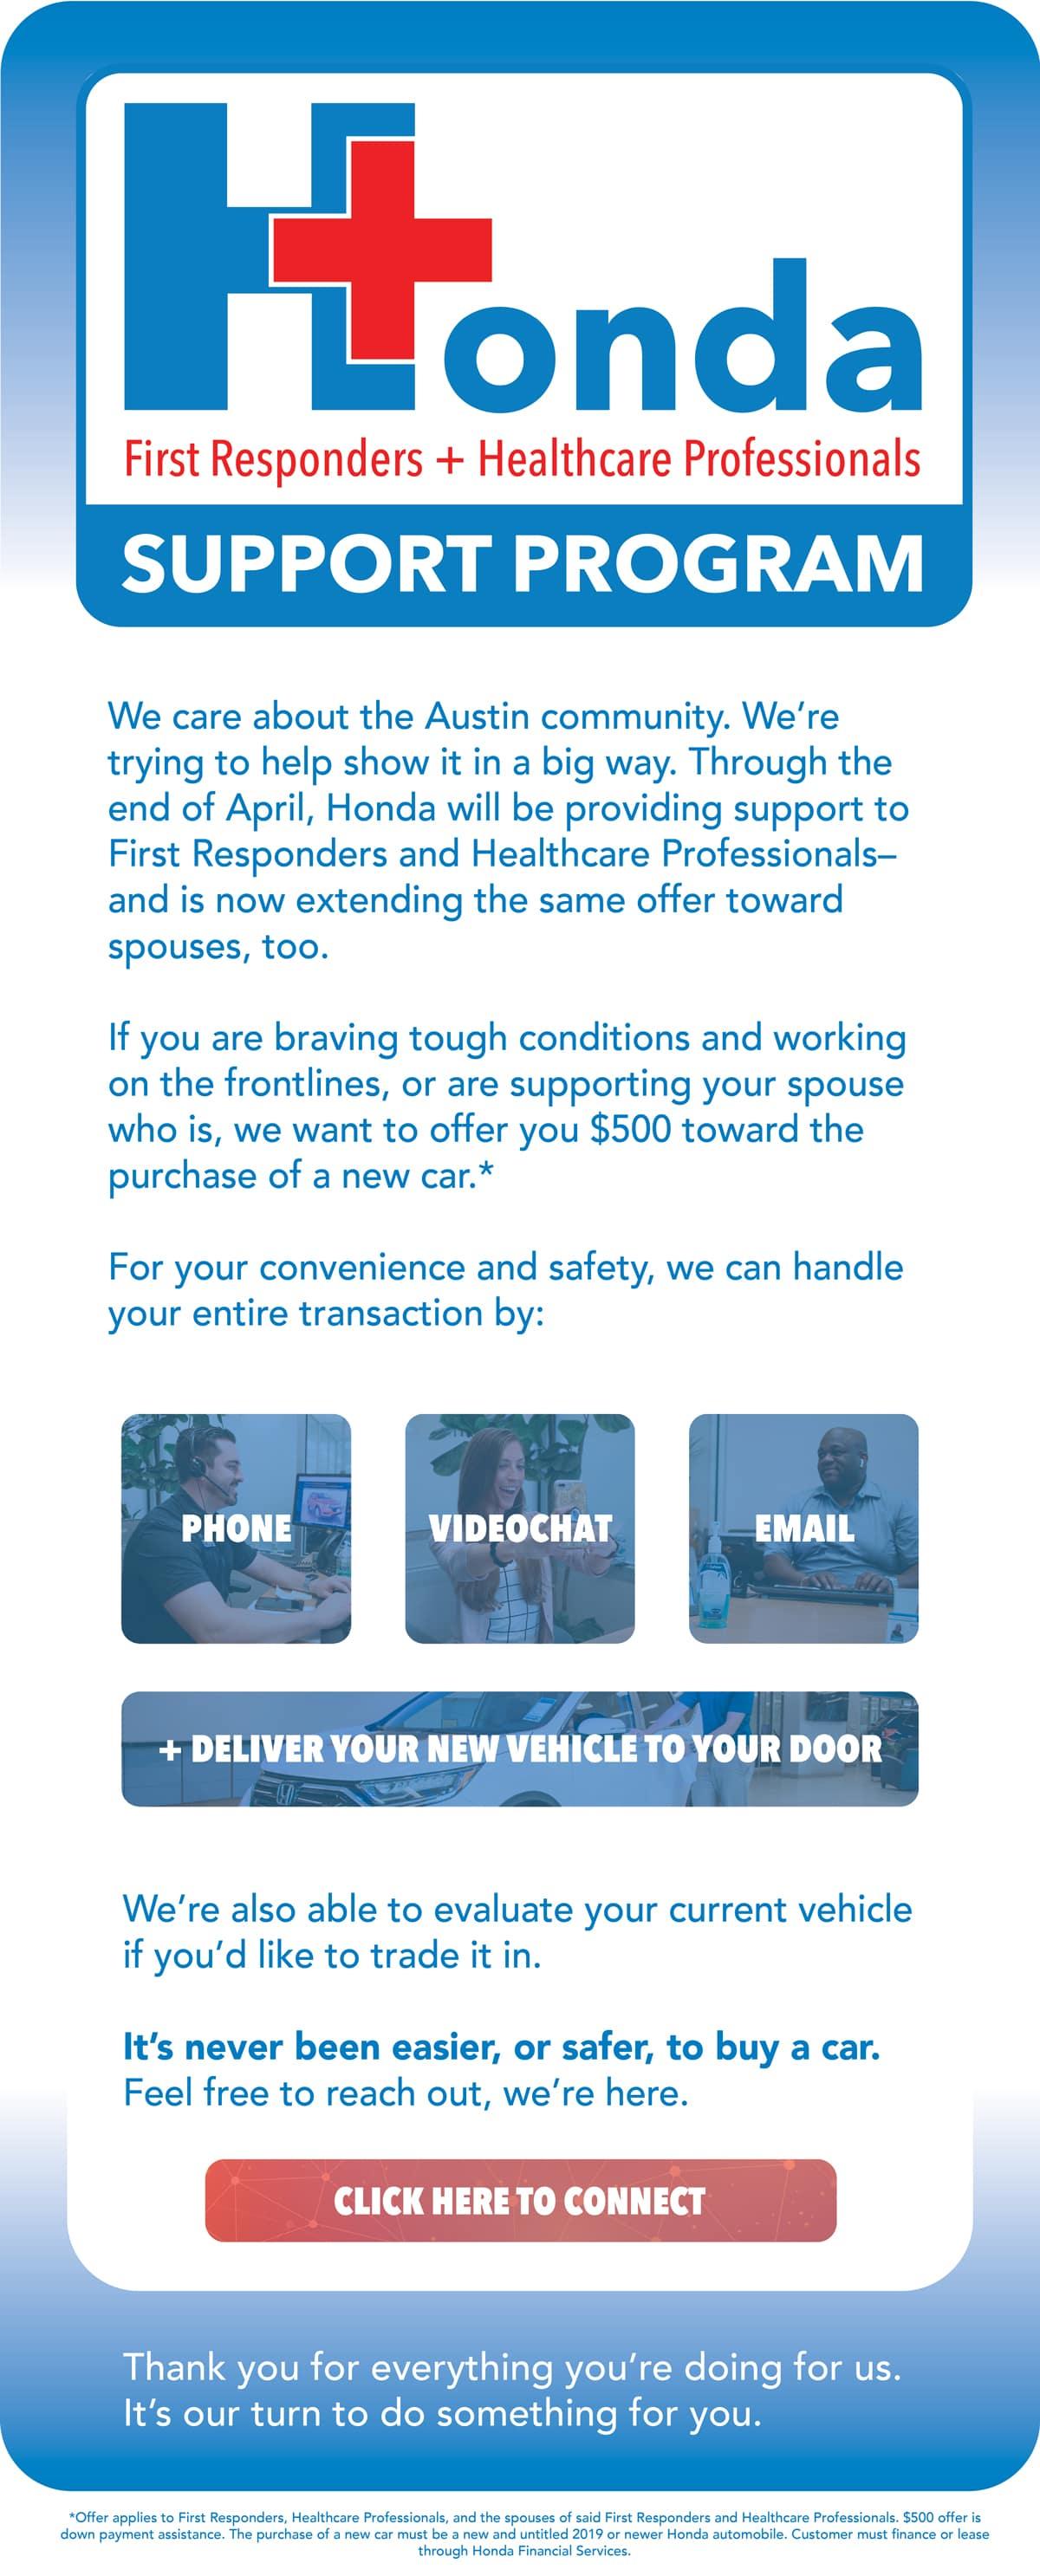 Honda First Responders Support Program in Austin, TX